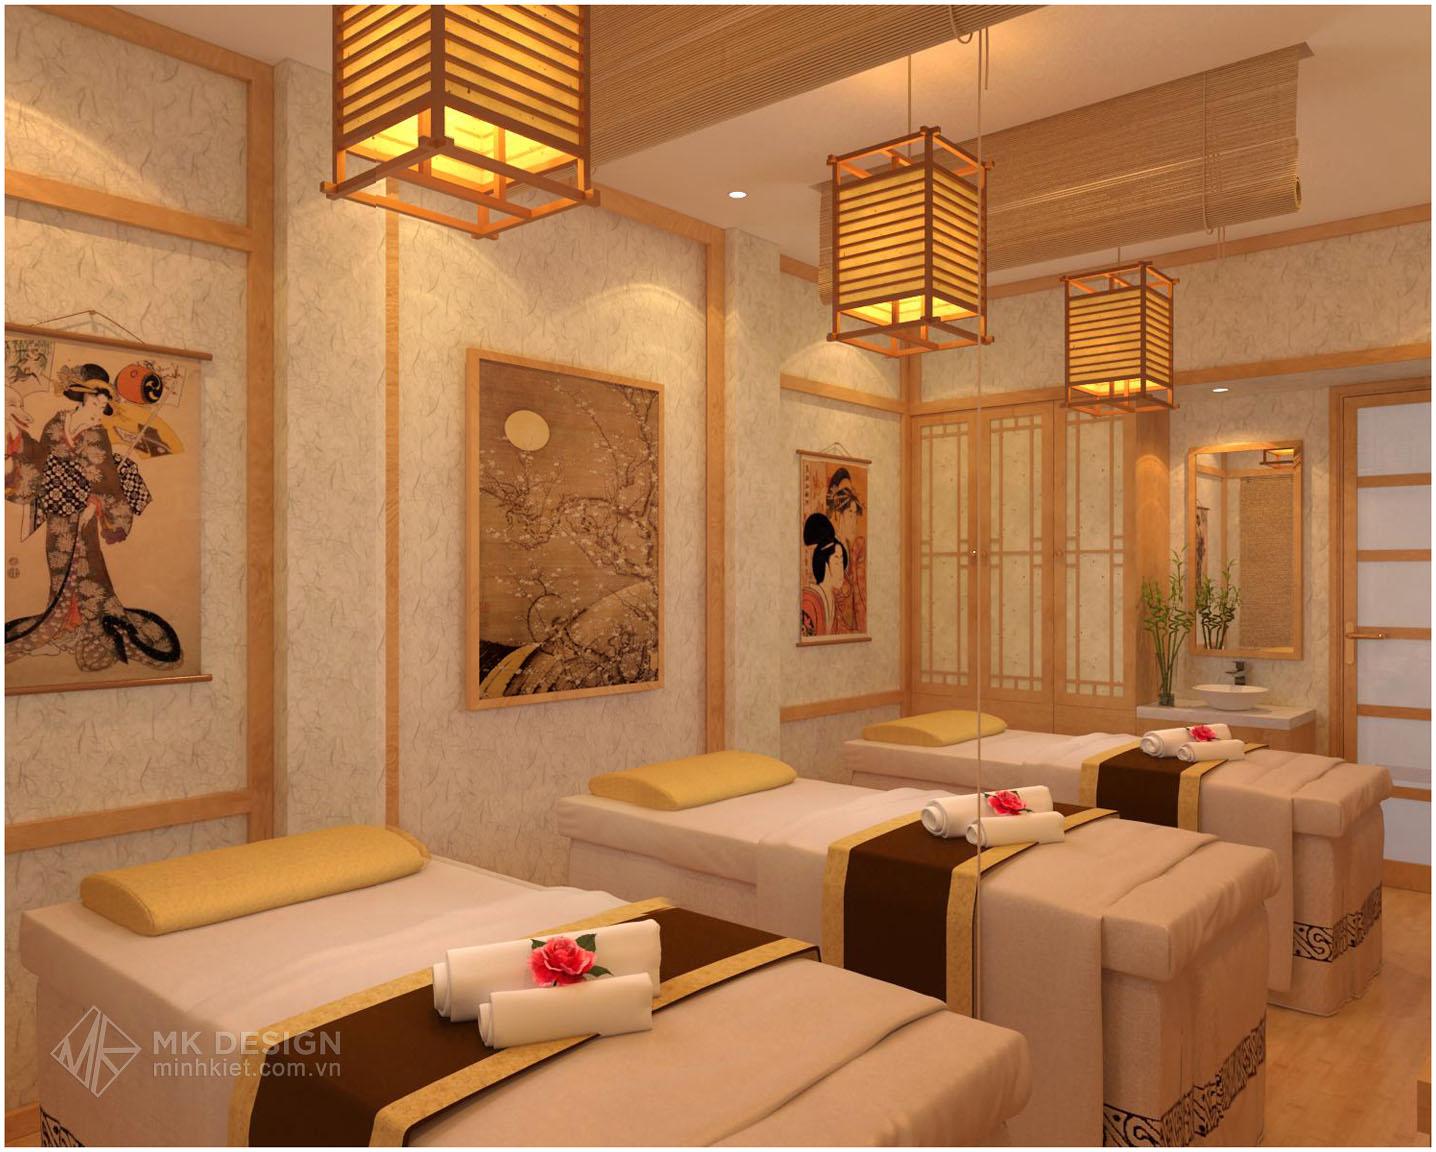 spa-momo-nhat-ban-Minh-Kiet-Design09